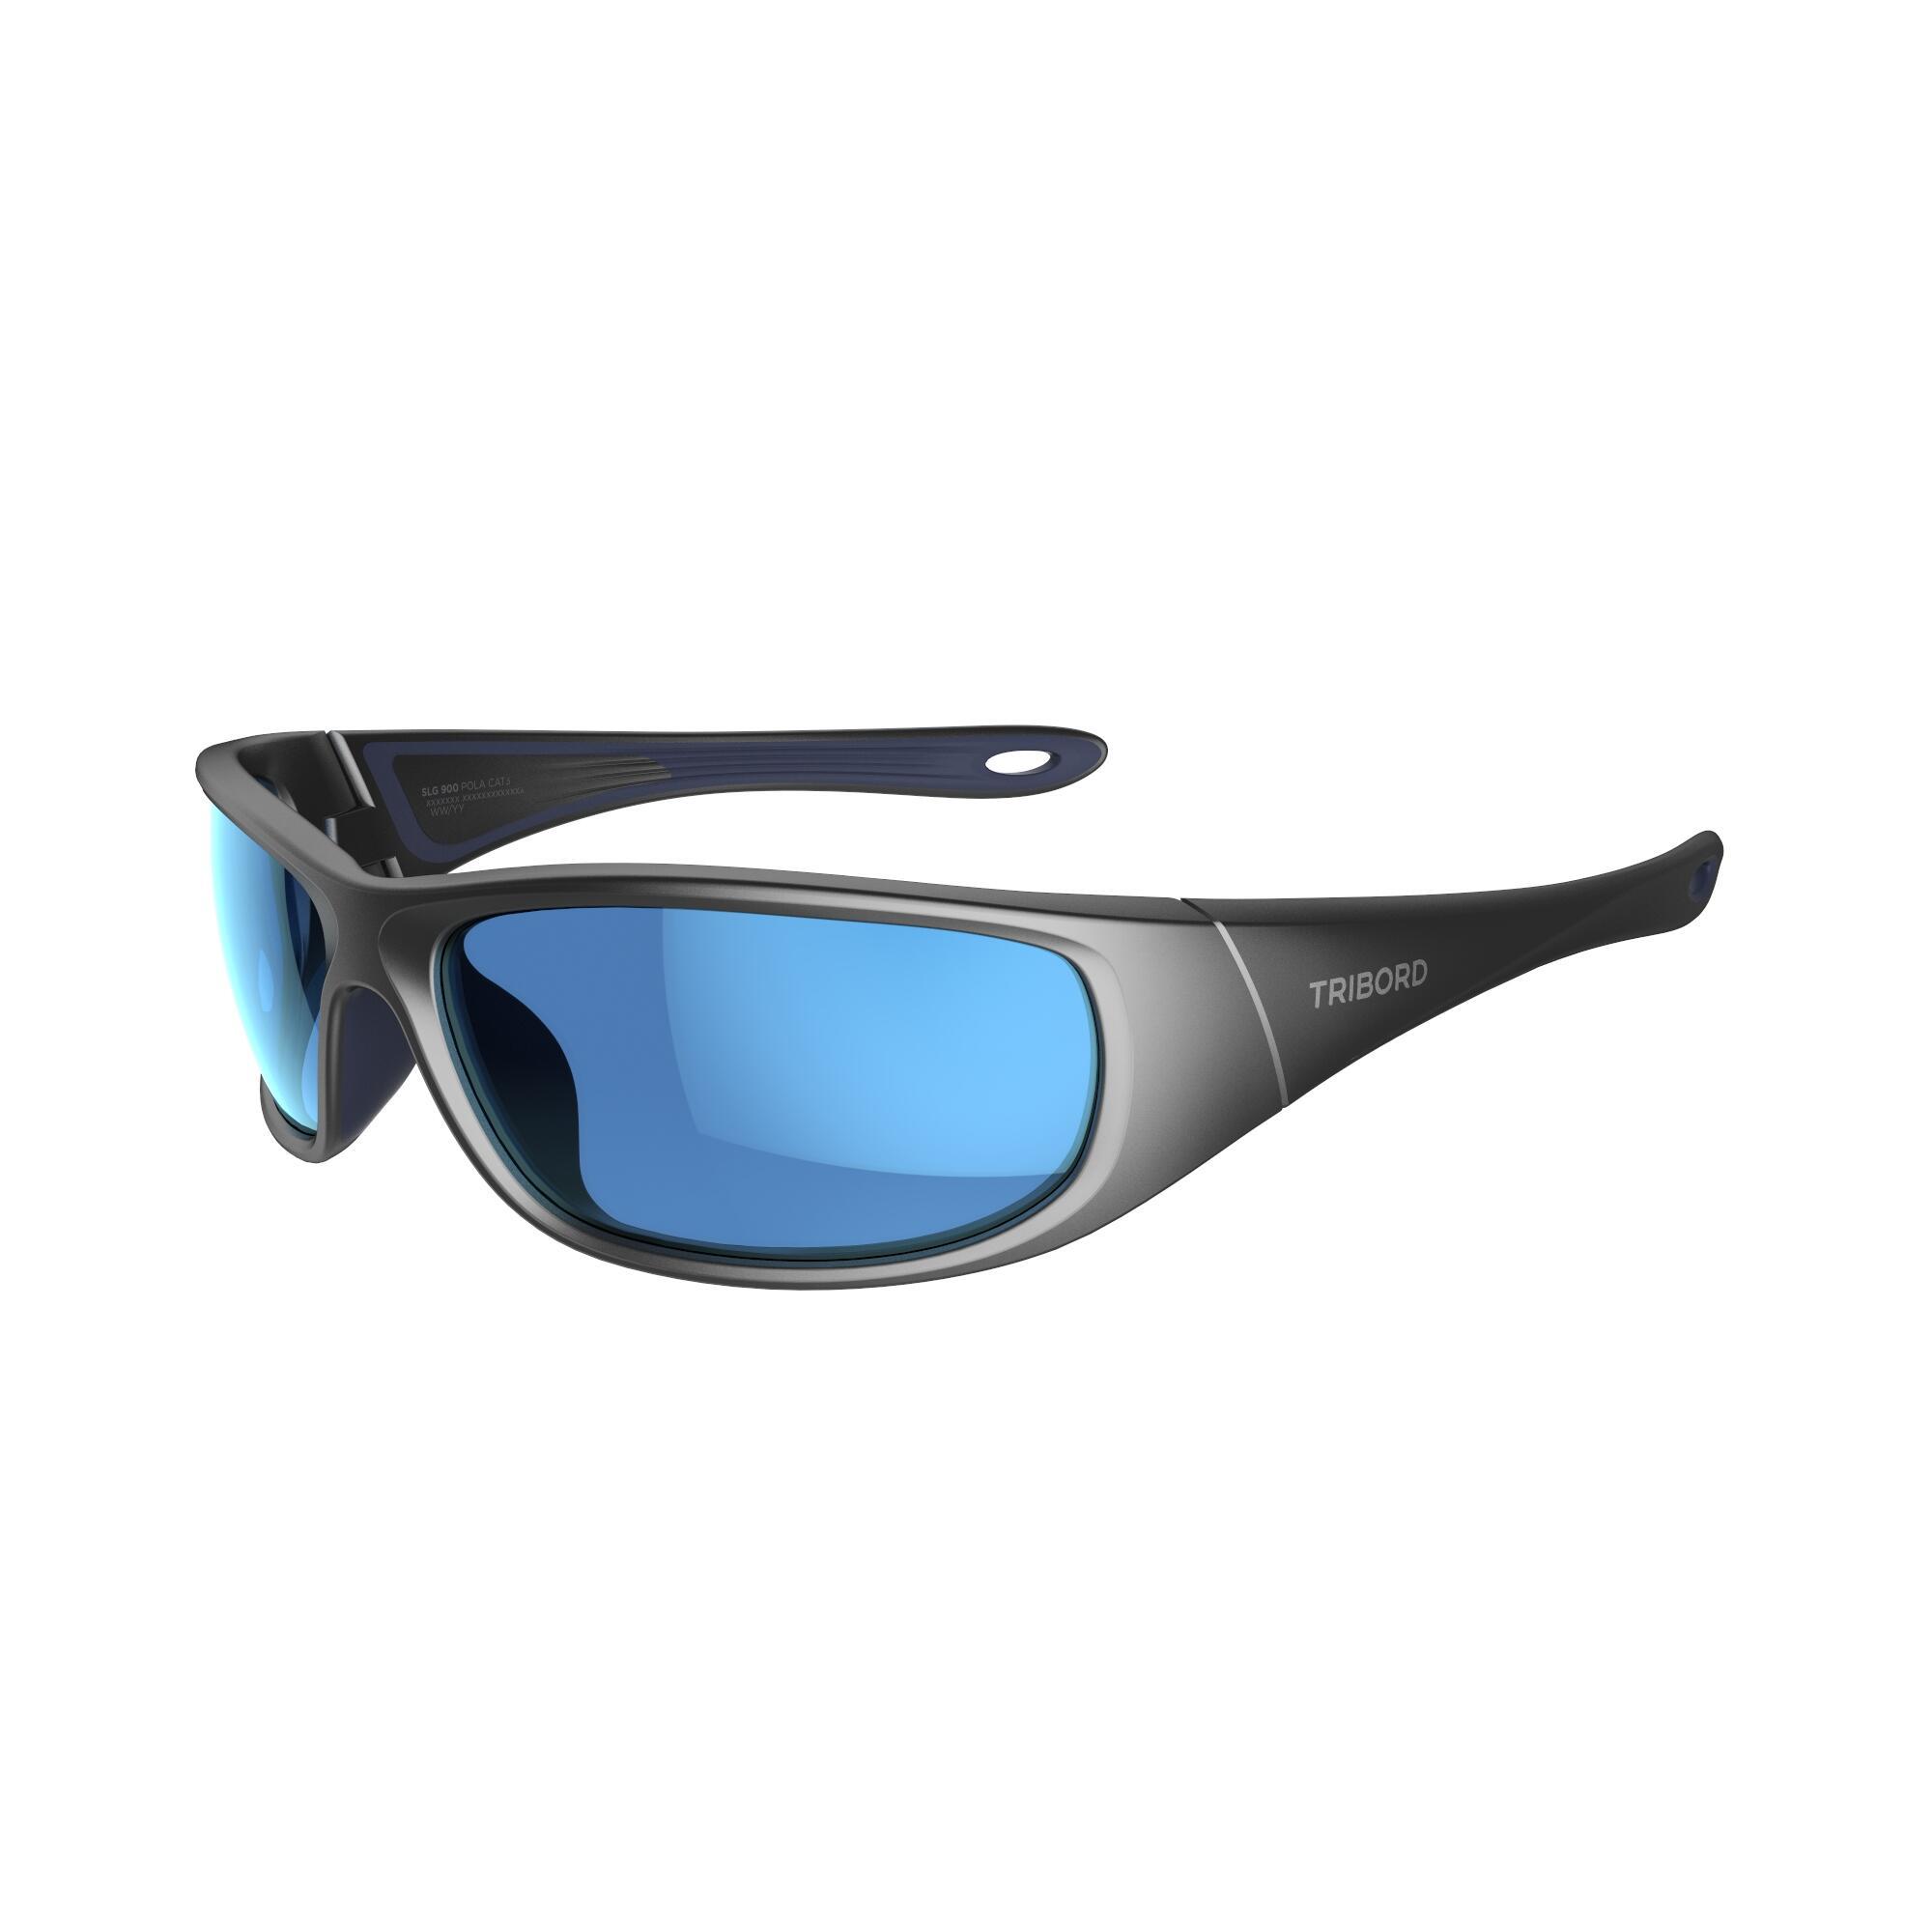 5f7f3ba411e Accessories Sailing 900 Adult Polarised Sailing Sunglasses Category 3 -  Grey - Decathlon